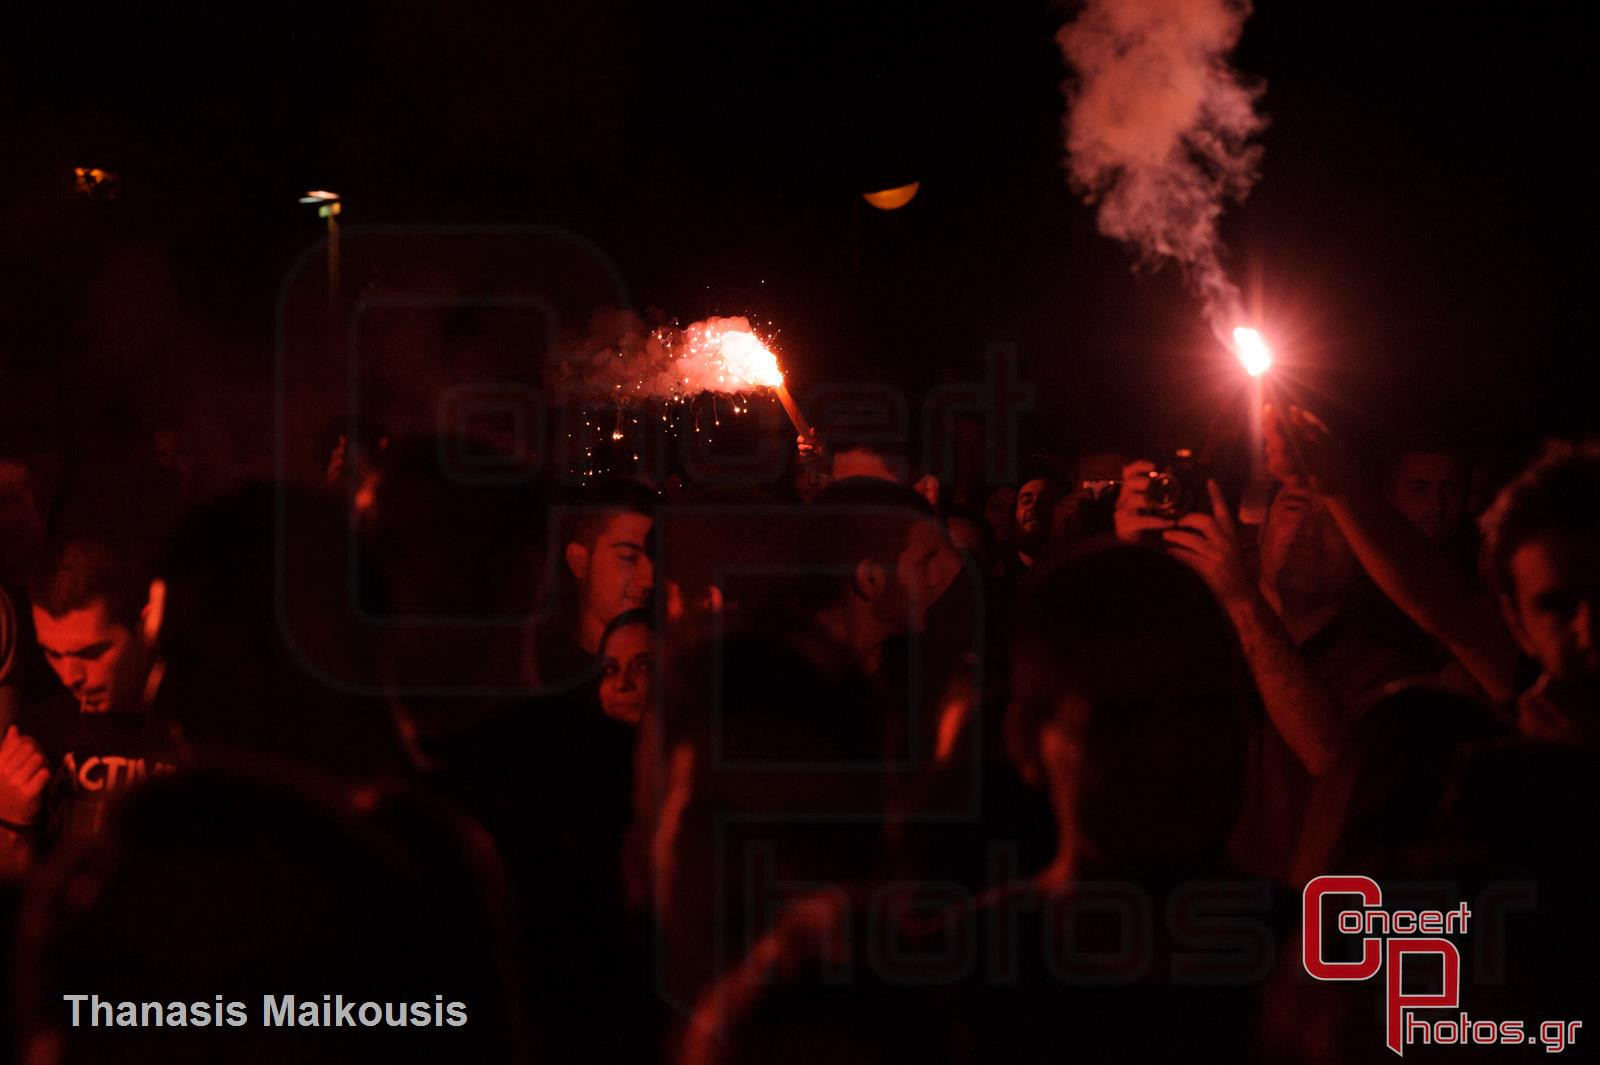 Active Member - Τραγούδα μας να φύγει το σκοτάδι- photographer: Thanasis Maikousis - concertphotos_-4835